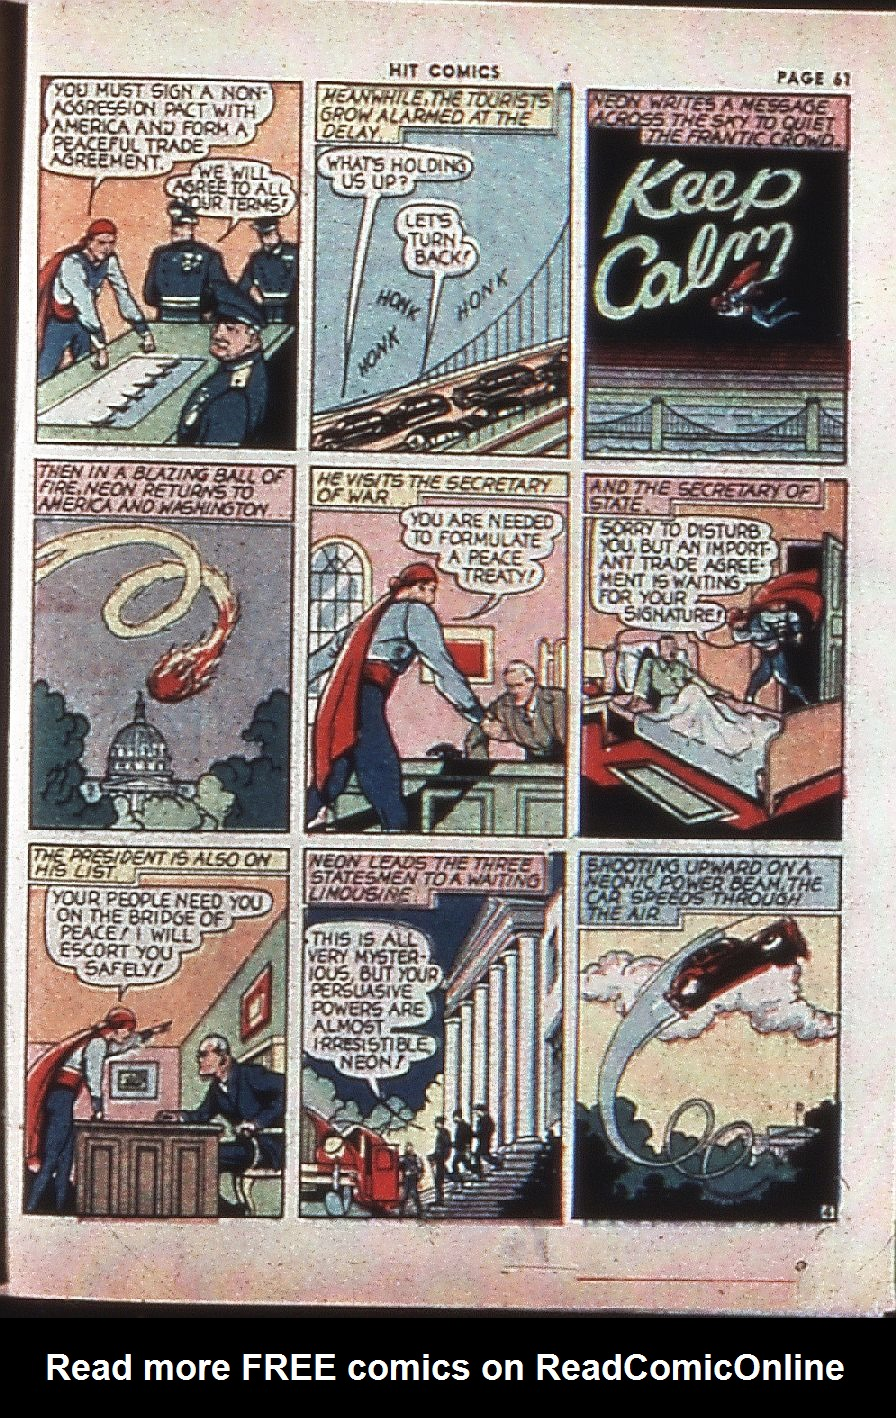 Read online Hit Comics comic -  Issue #4 - 63